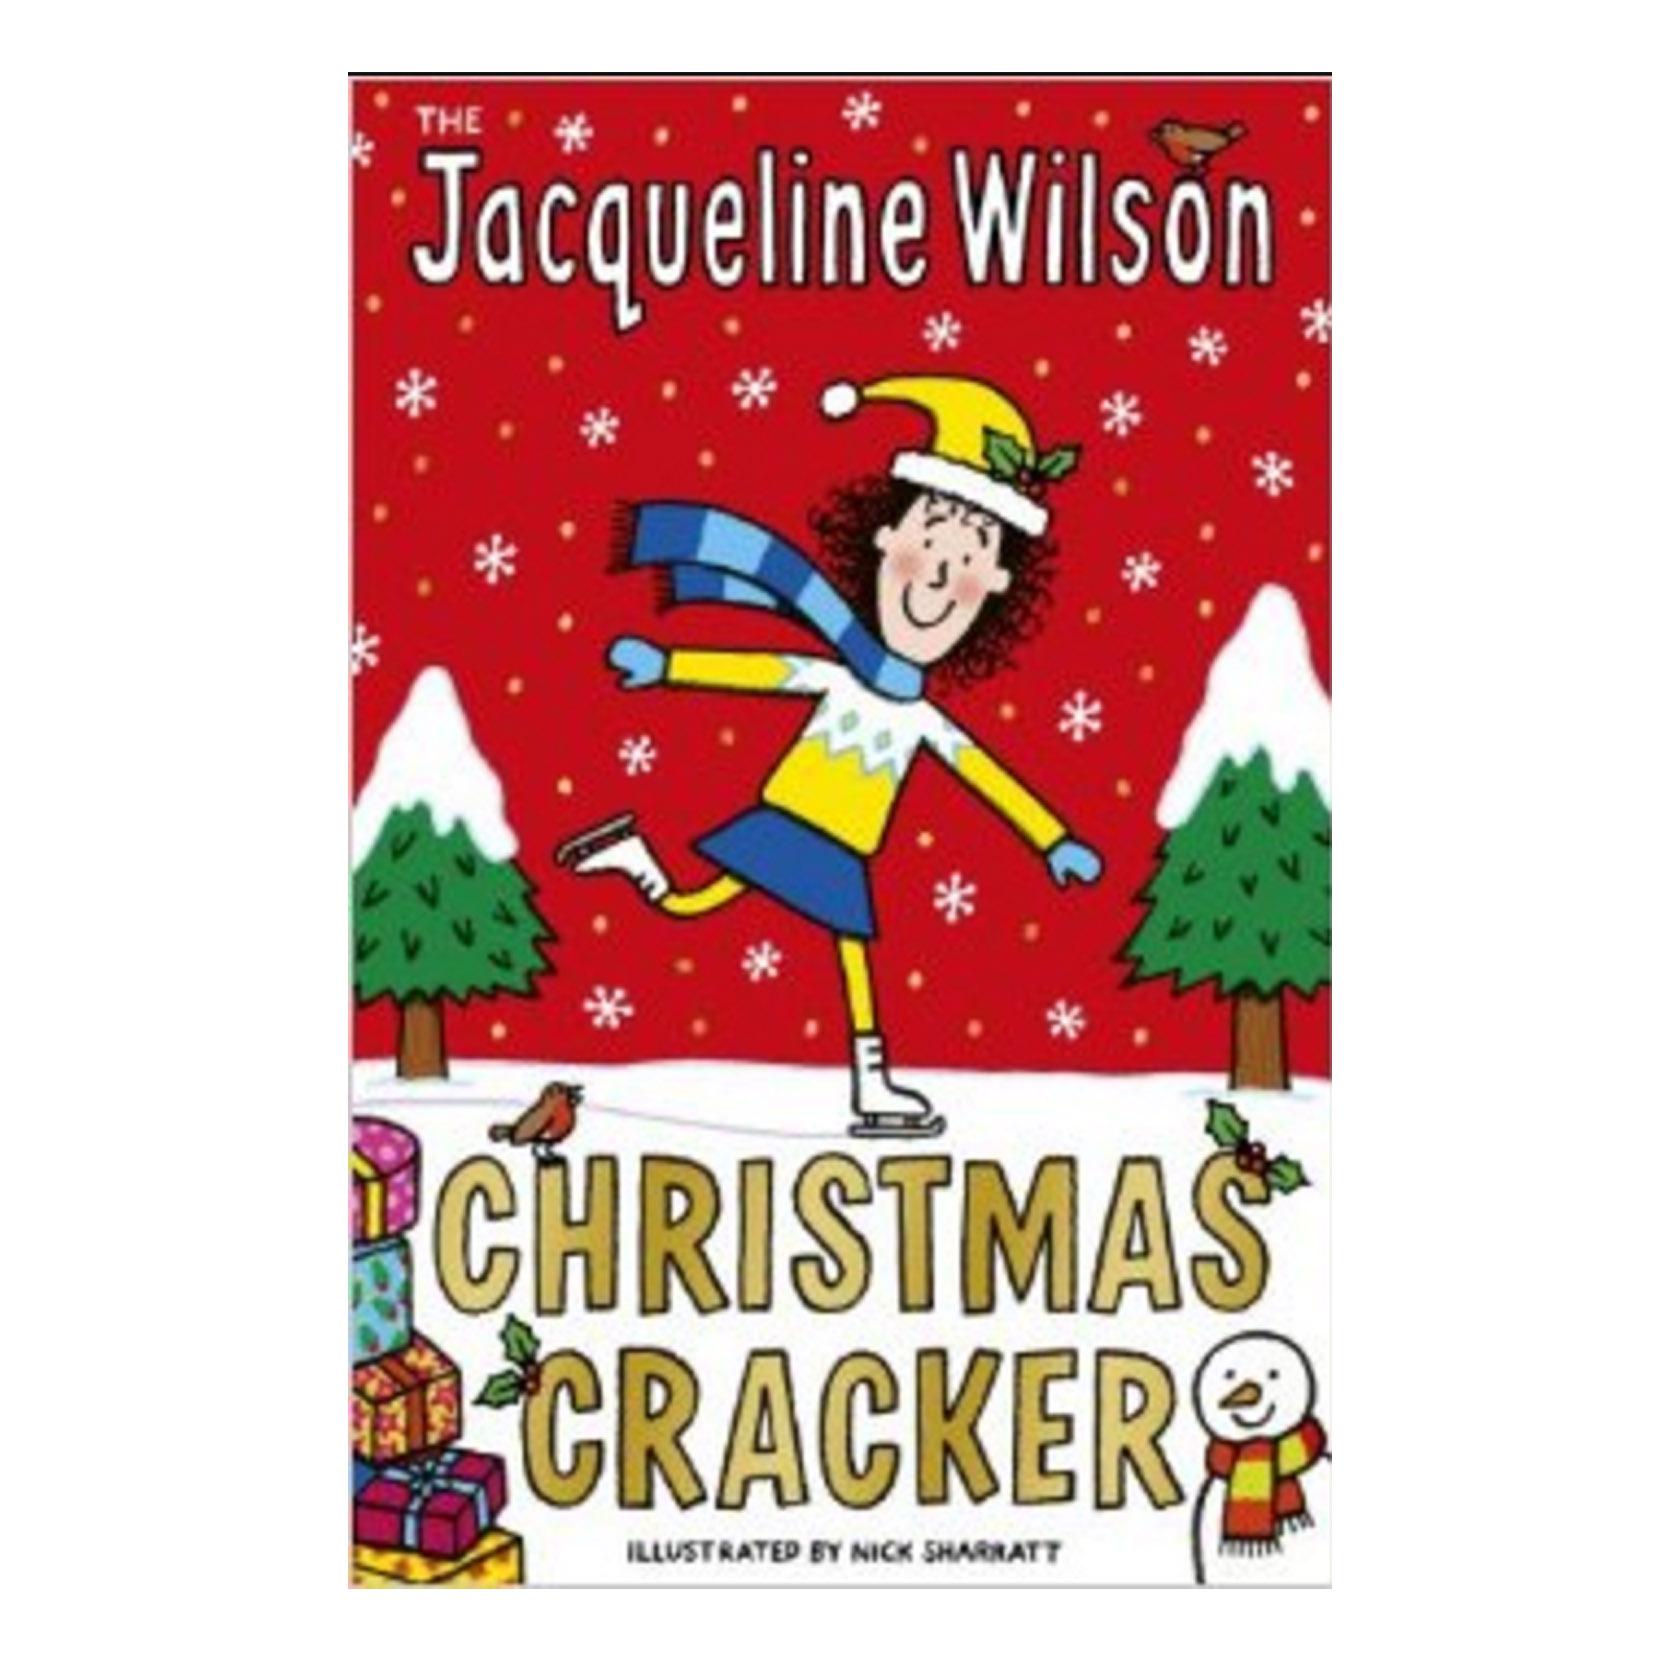 Christmas Cracker By Jacqueline Wilson A Novel Idea